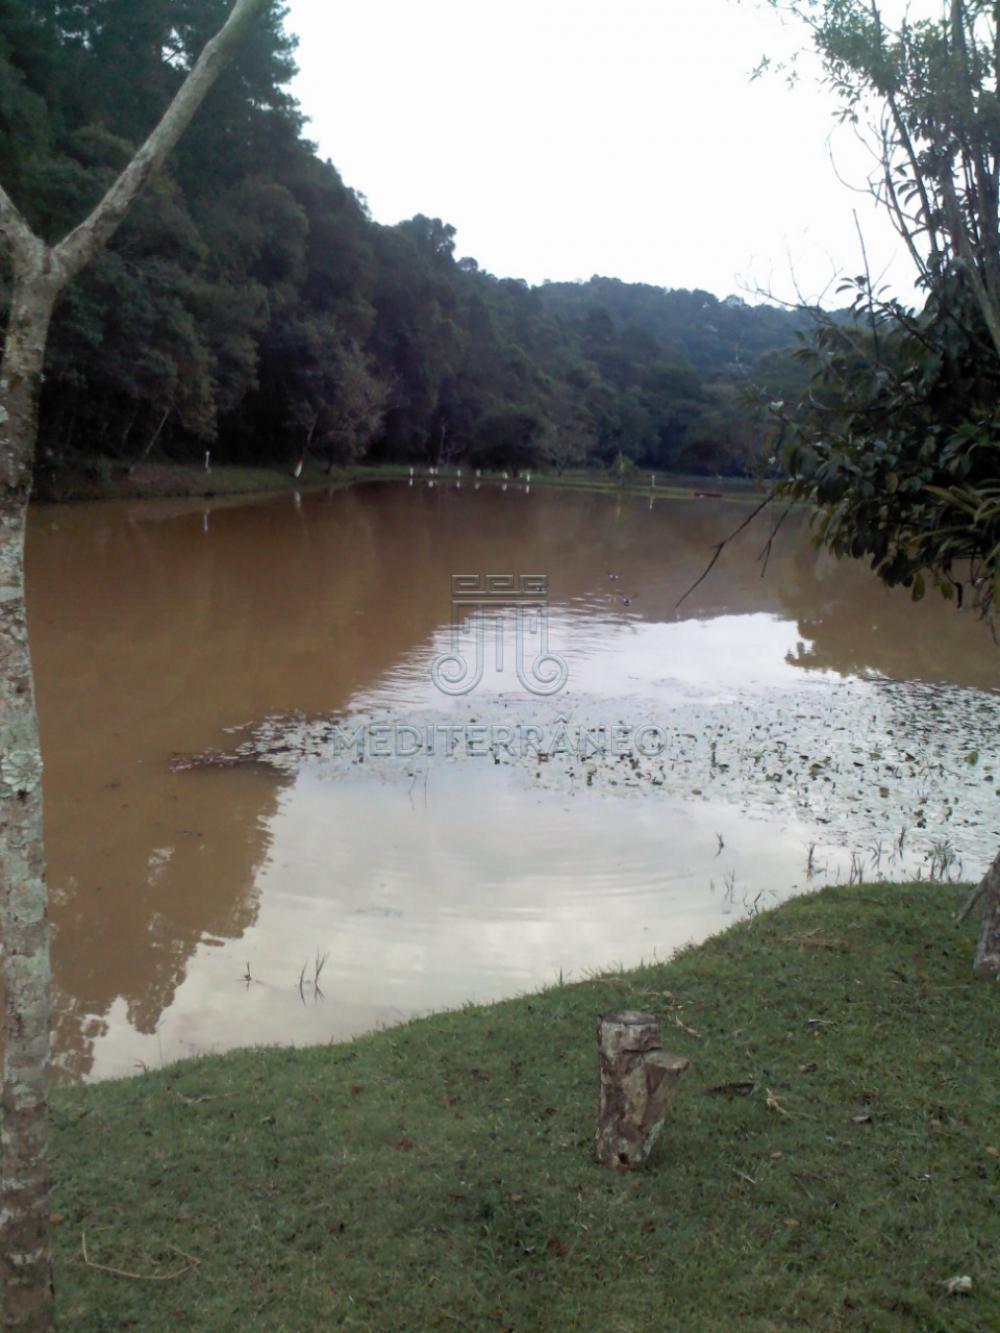 Comprar Terreno / Condomínio em Campo Limpo Paulista R$ 130.000,00 - Foto 11